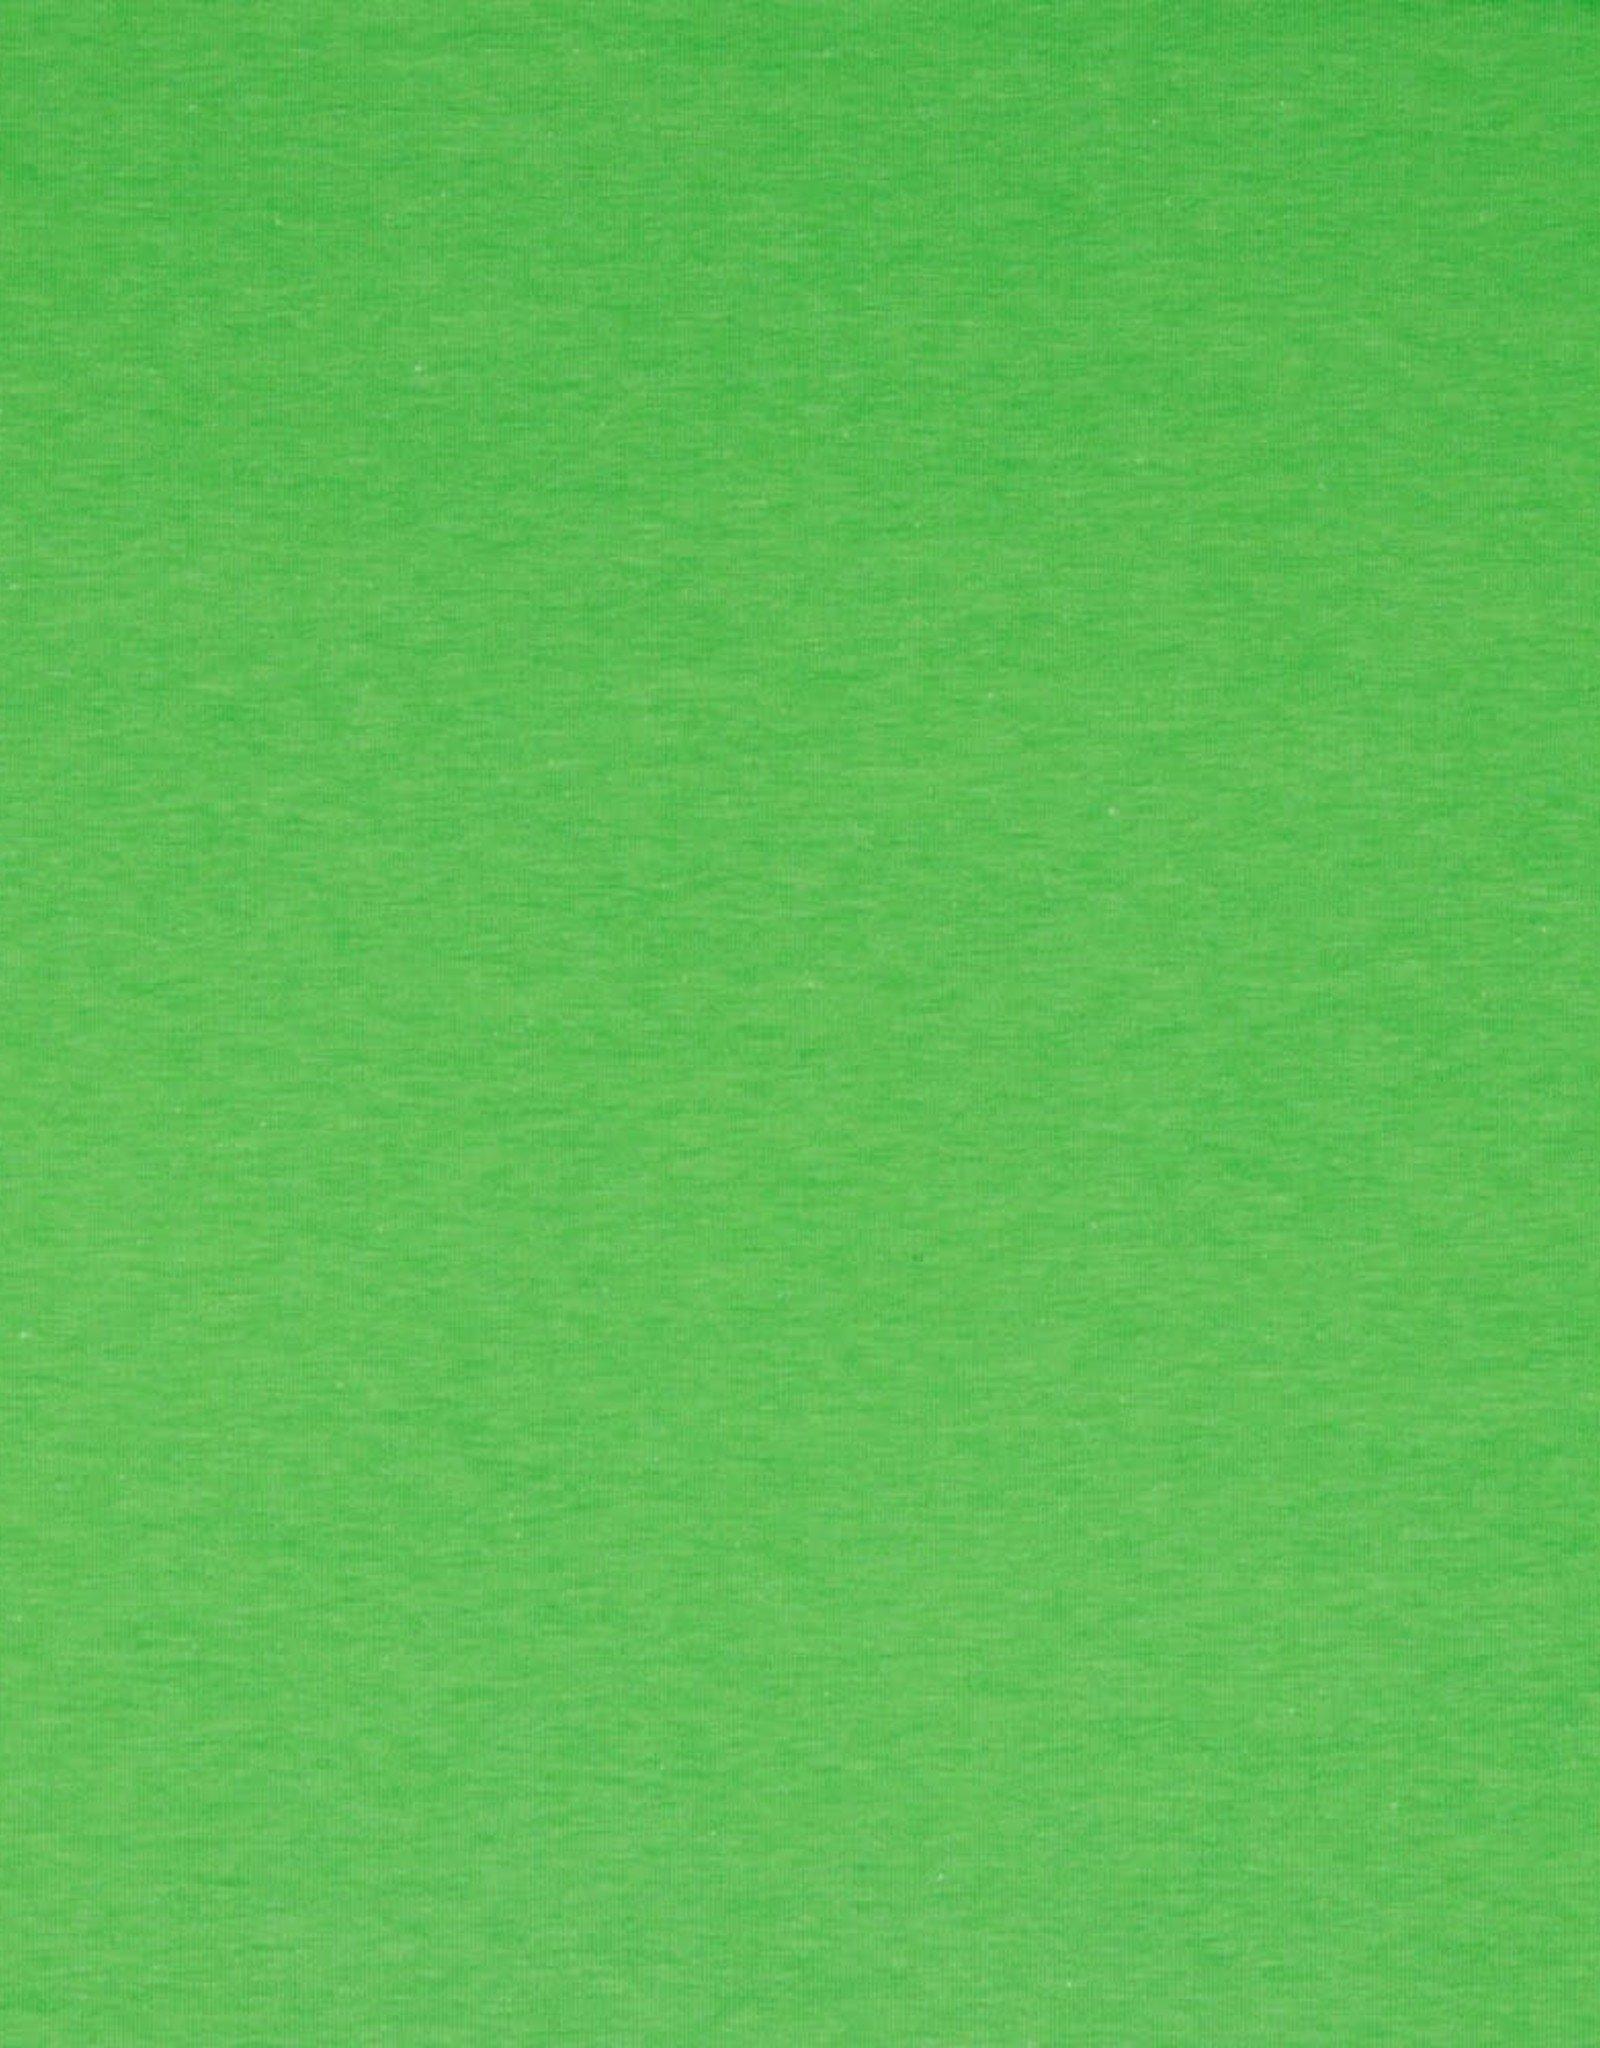 neon groen tricot